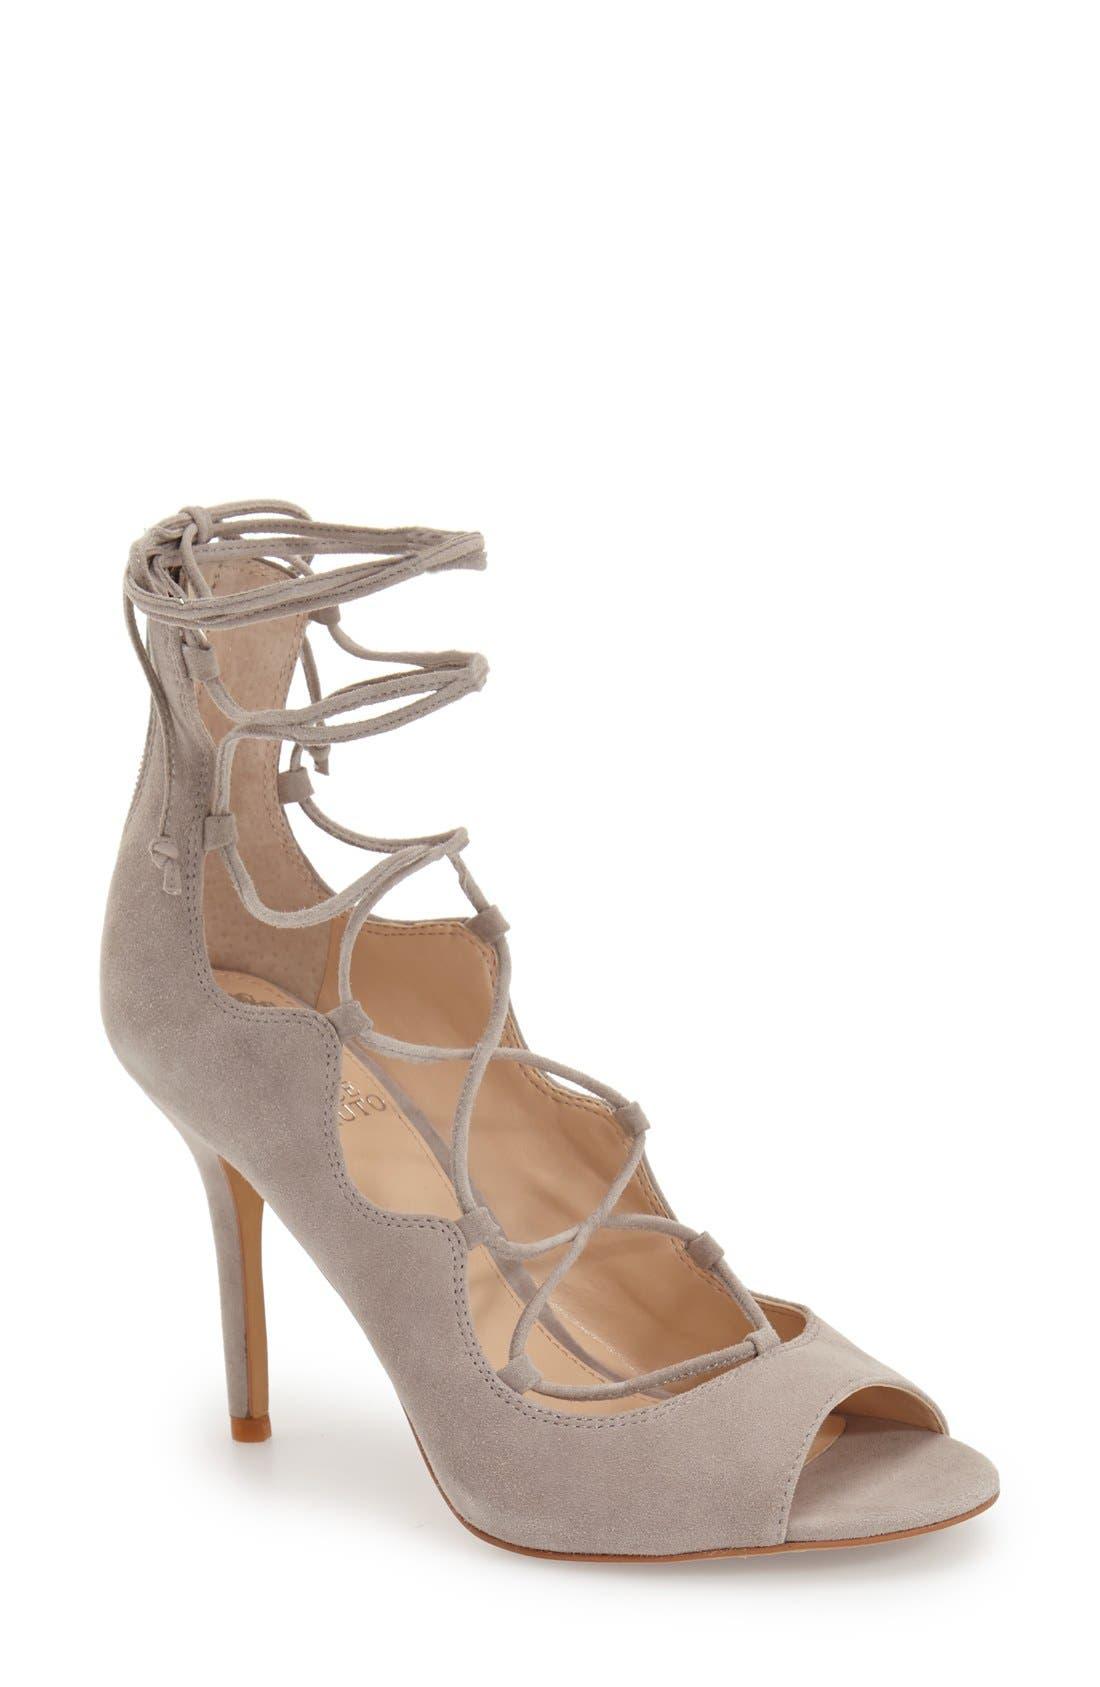 'Sandria' Peep Toe Ghillie Sandal,                             Main thumbnail 3, color,